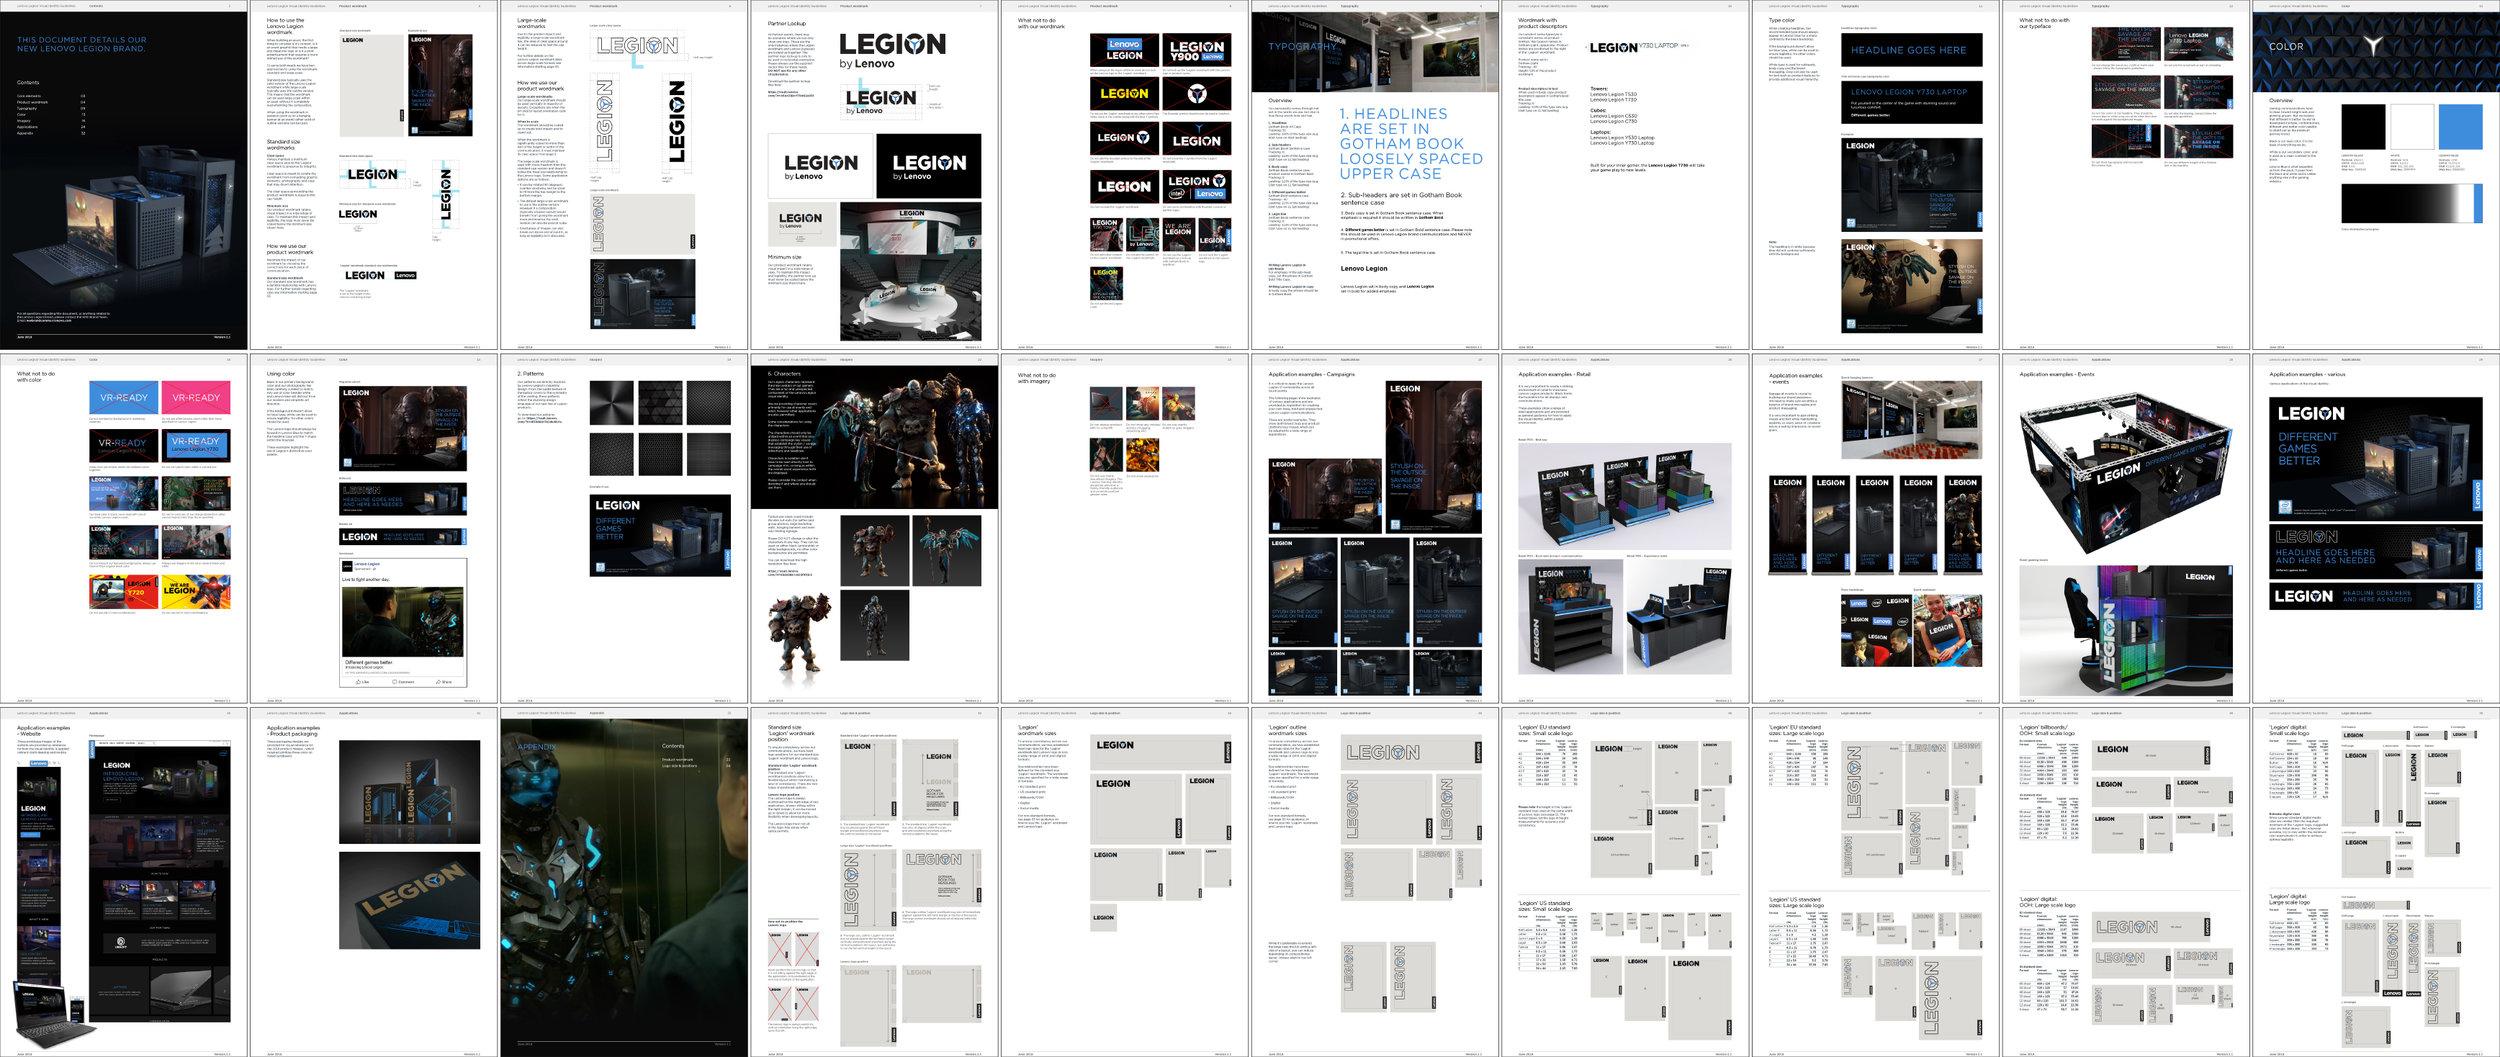 Legion-guides-2.jpg